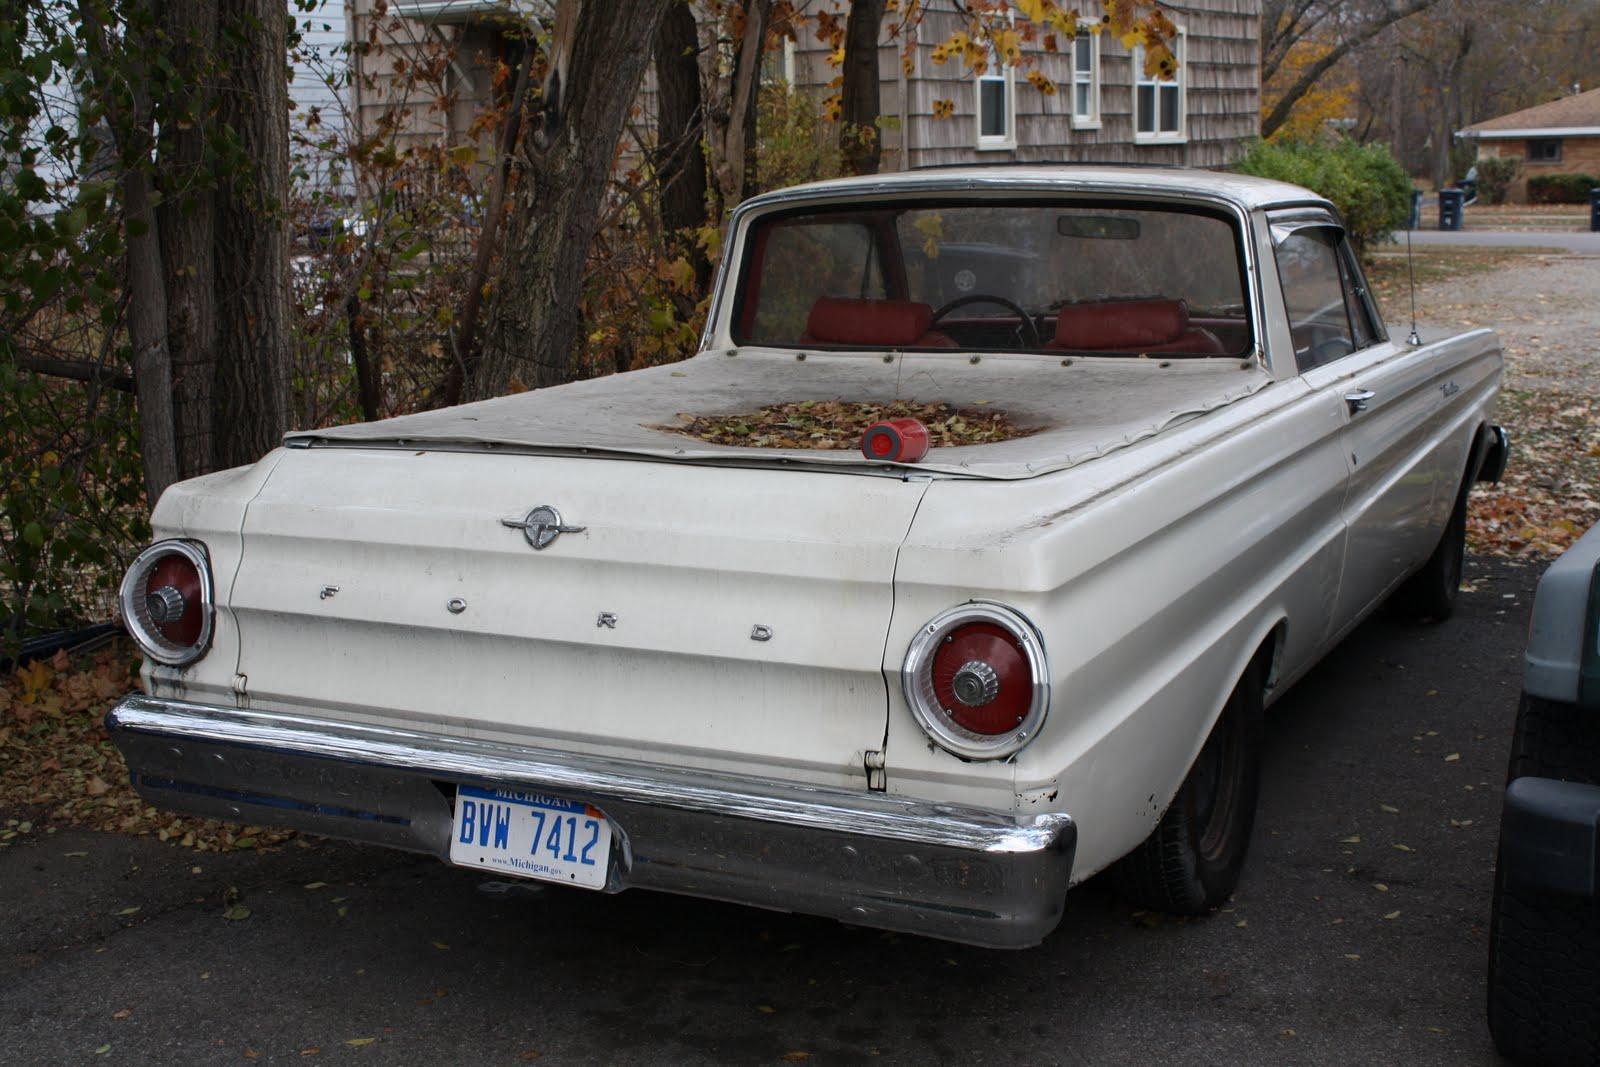 1964 Ford Falcon Ranchero Craigslist Beaterblog Beat On The Street